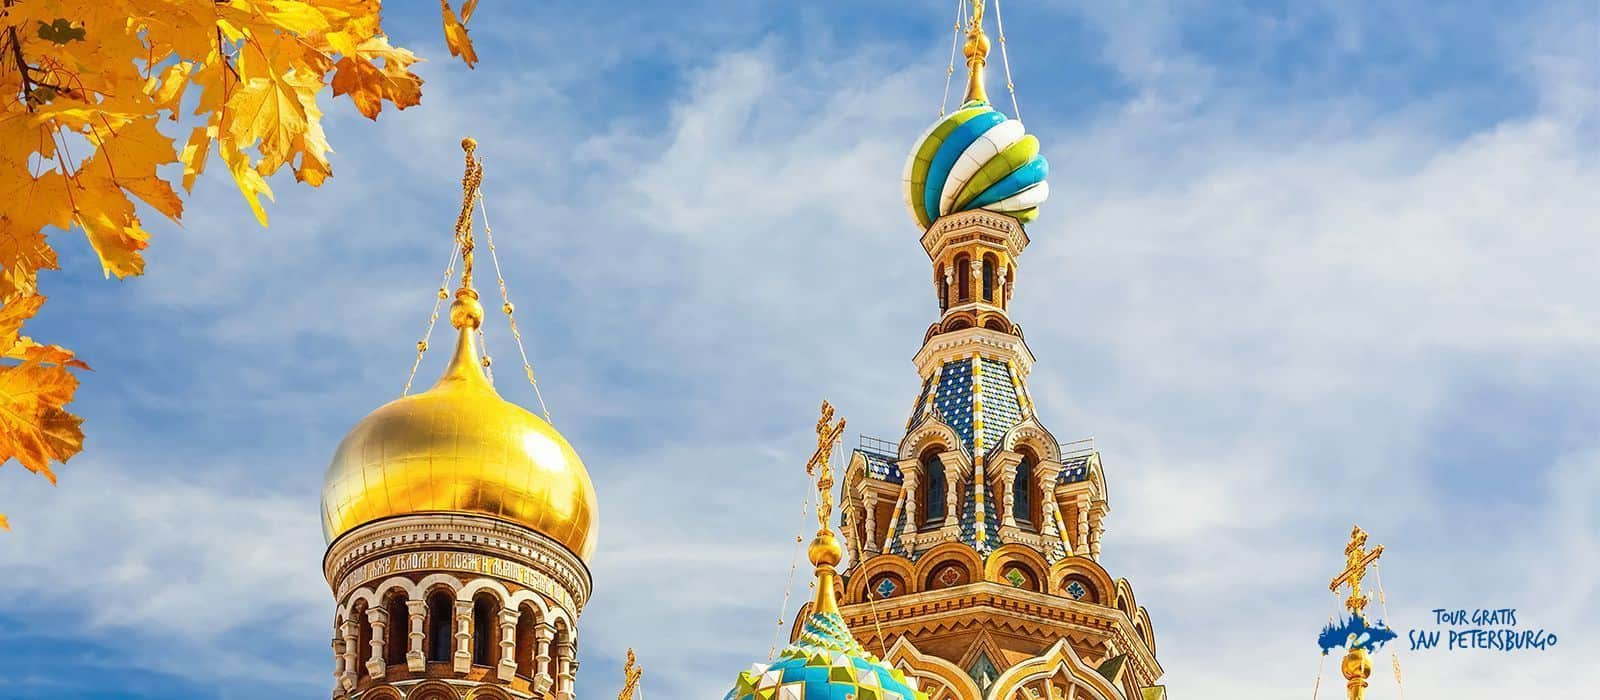 Tour Gratis Centro San Petersburgo